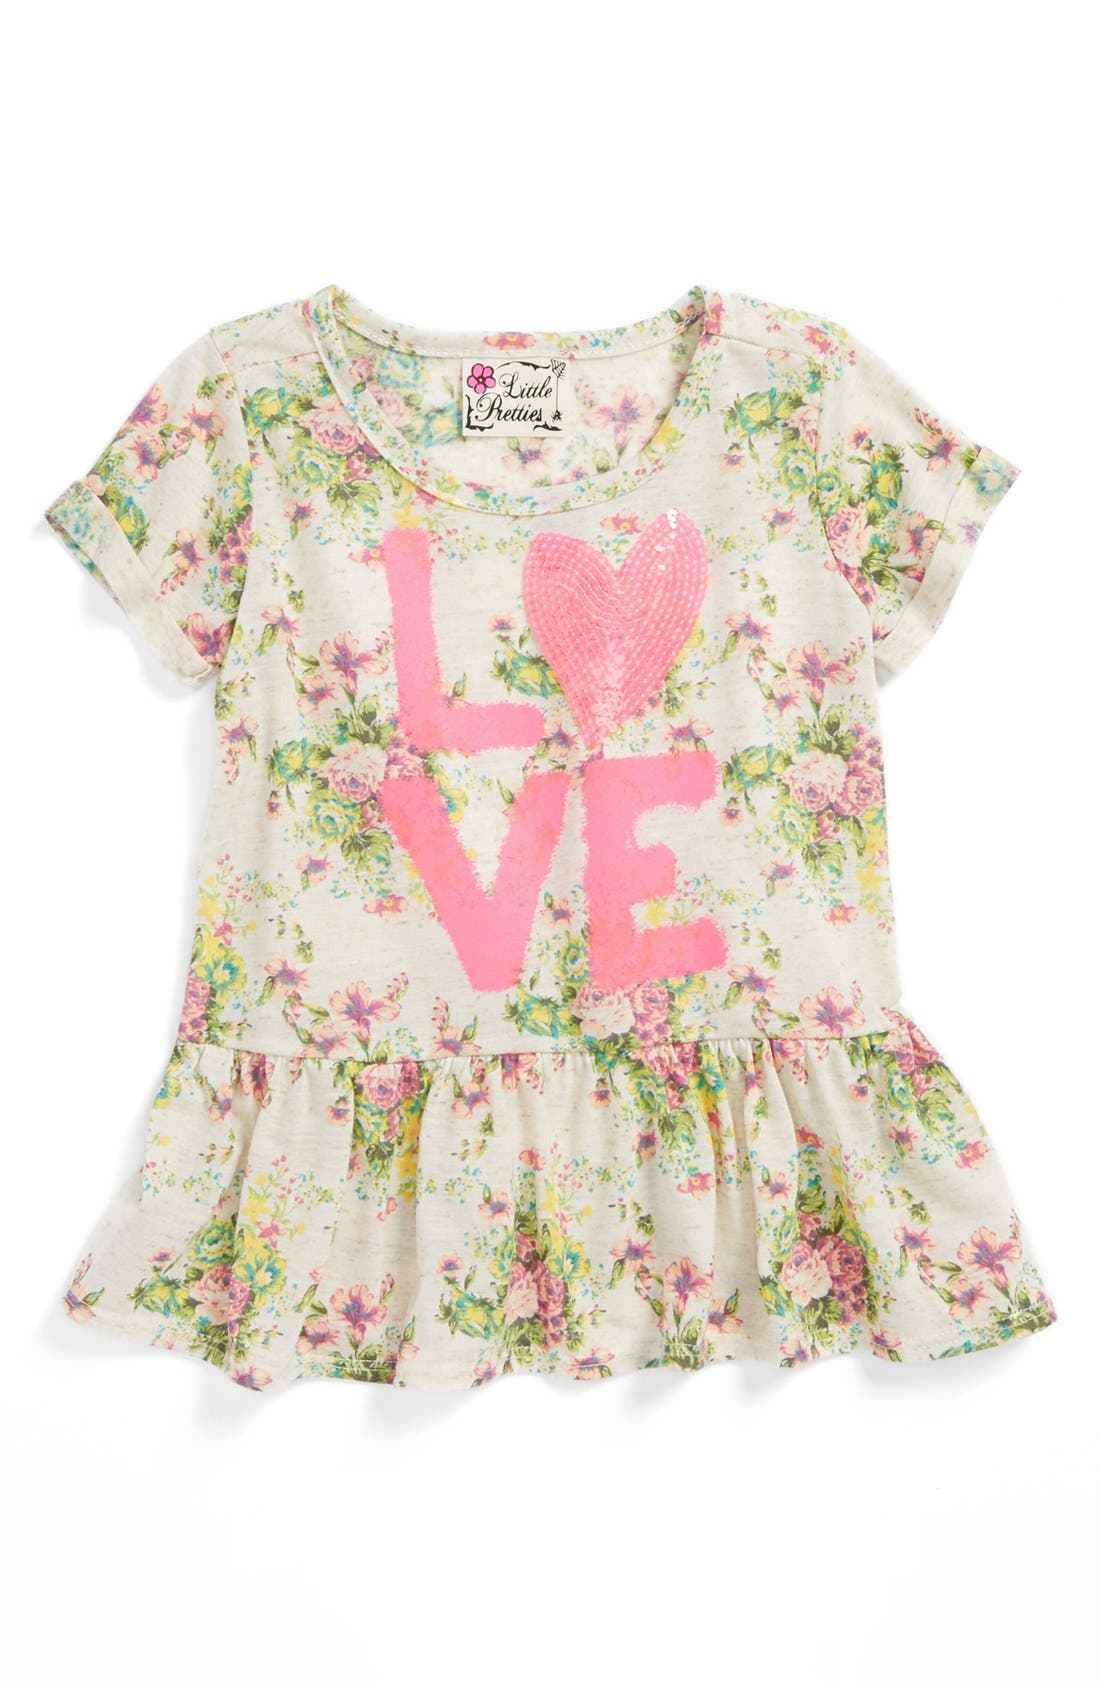 Main Image - Little Pretties 'Love' Peplum Tee (Toddler Girls)